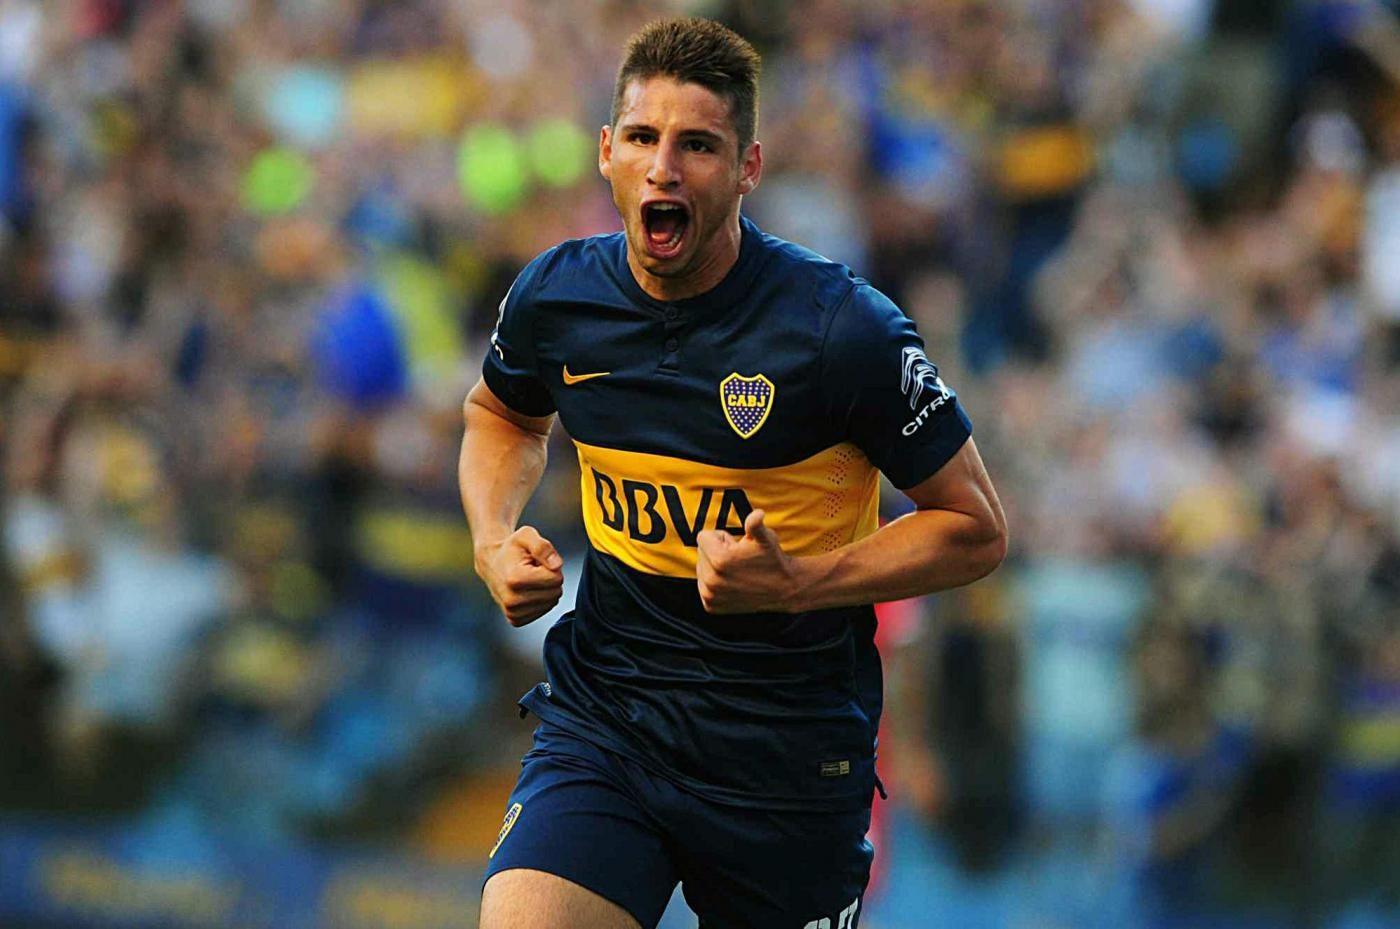 Estudiantes-Boca Juniors domenica 10 dicembre